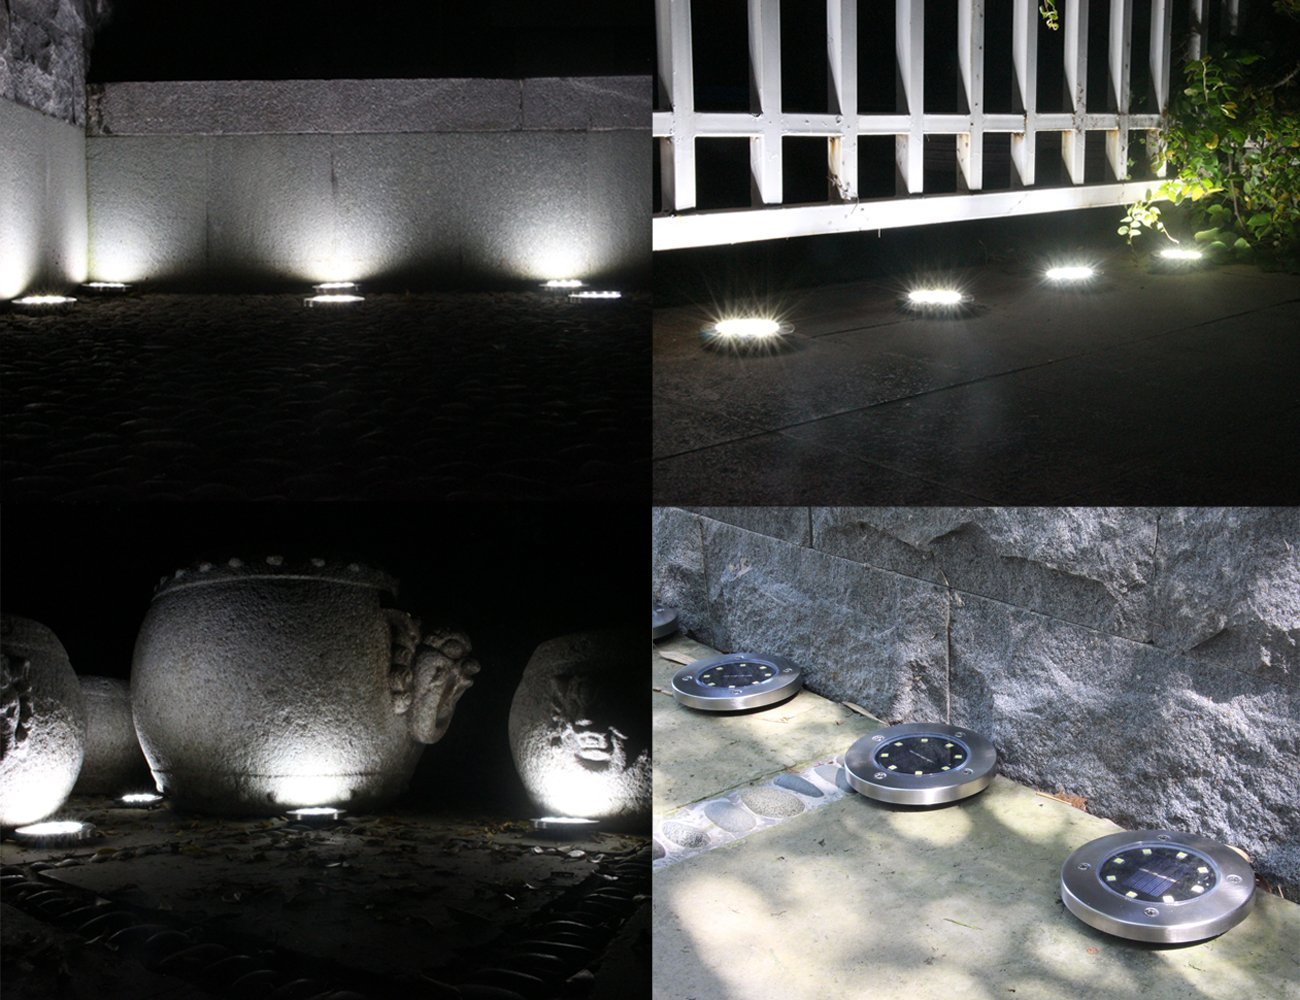 Led lampada perle solare luce esterna giardino illuminazione